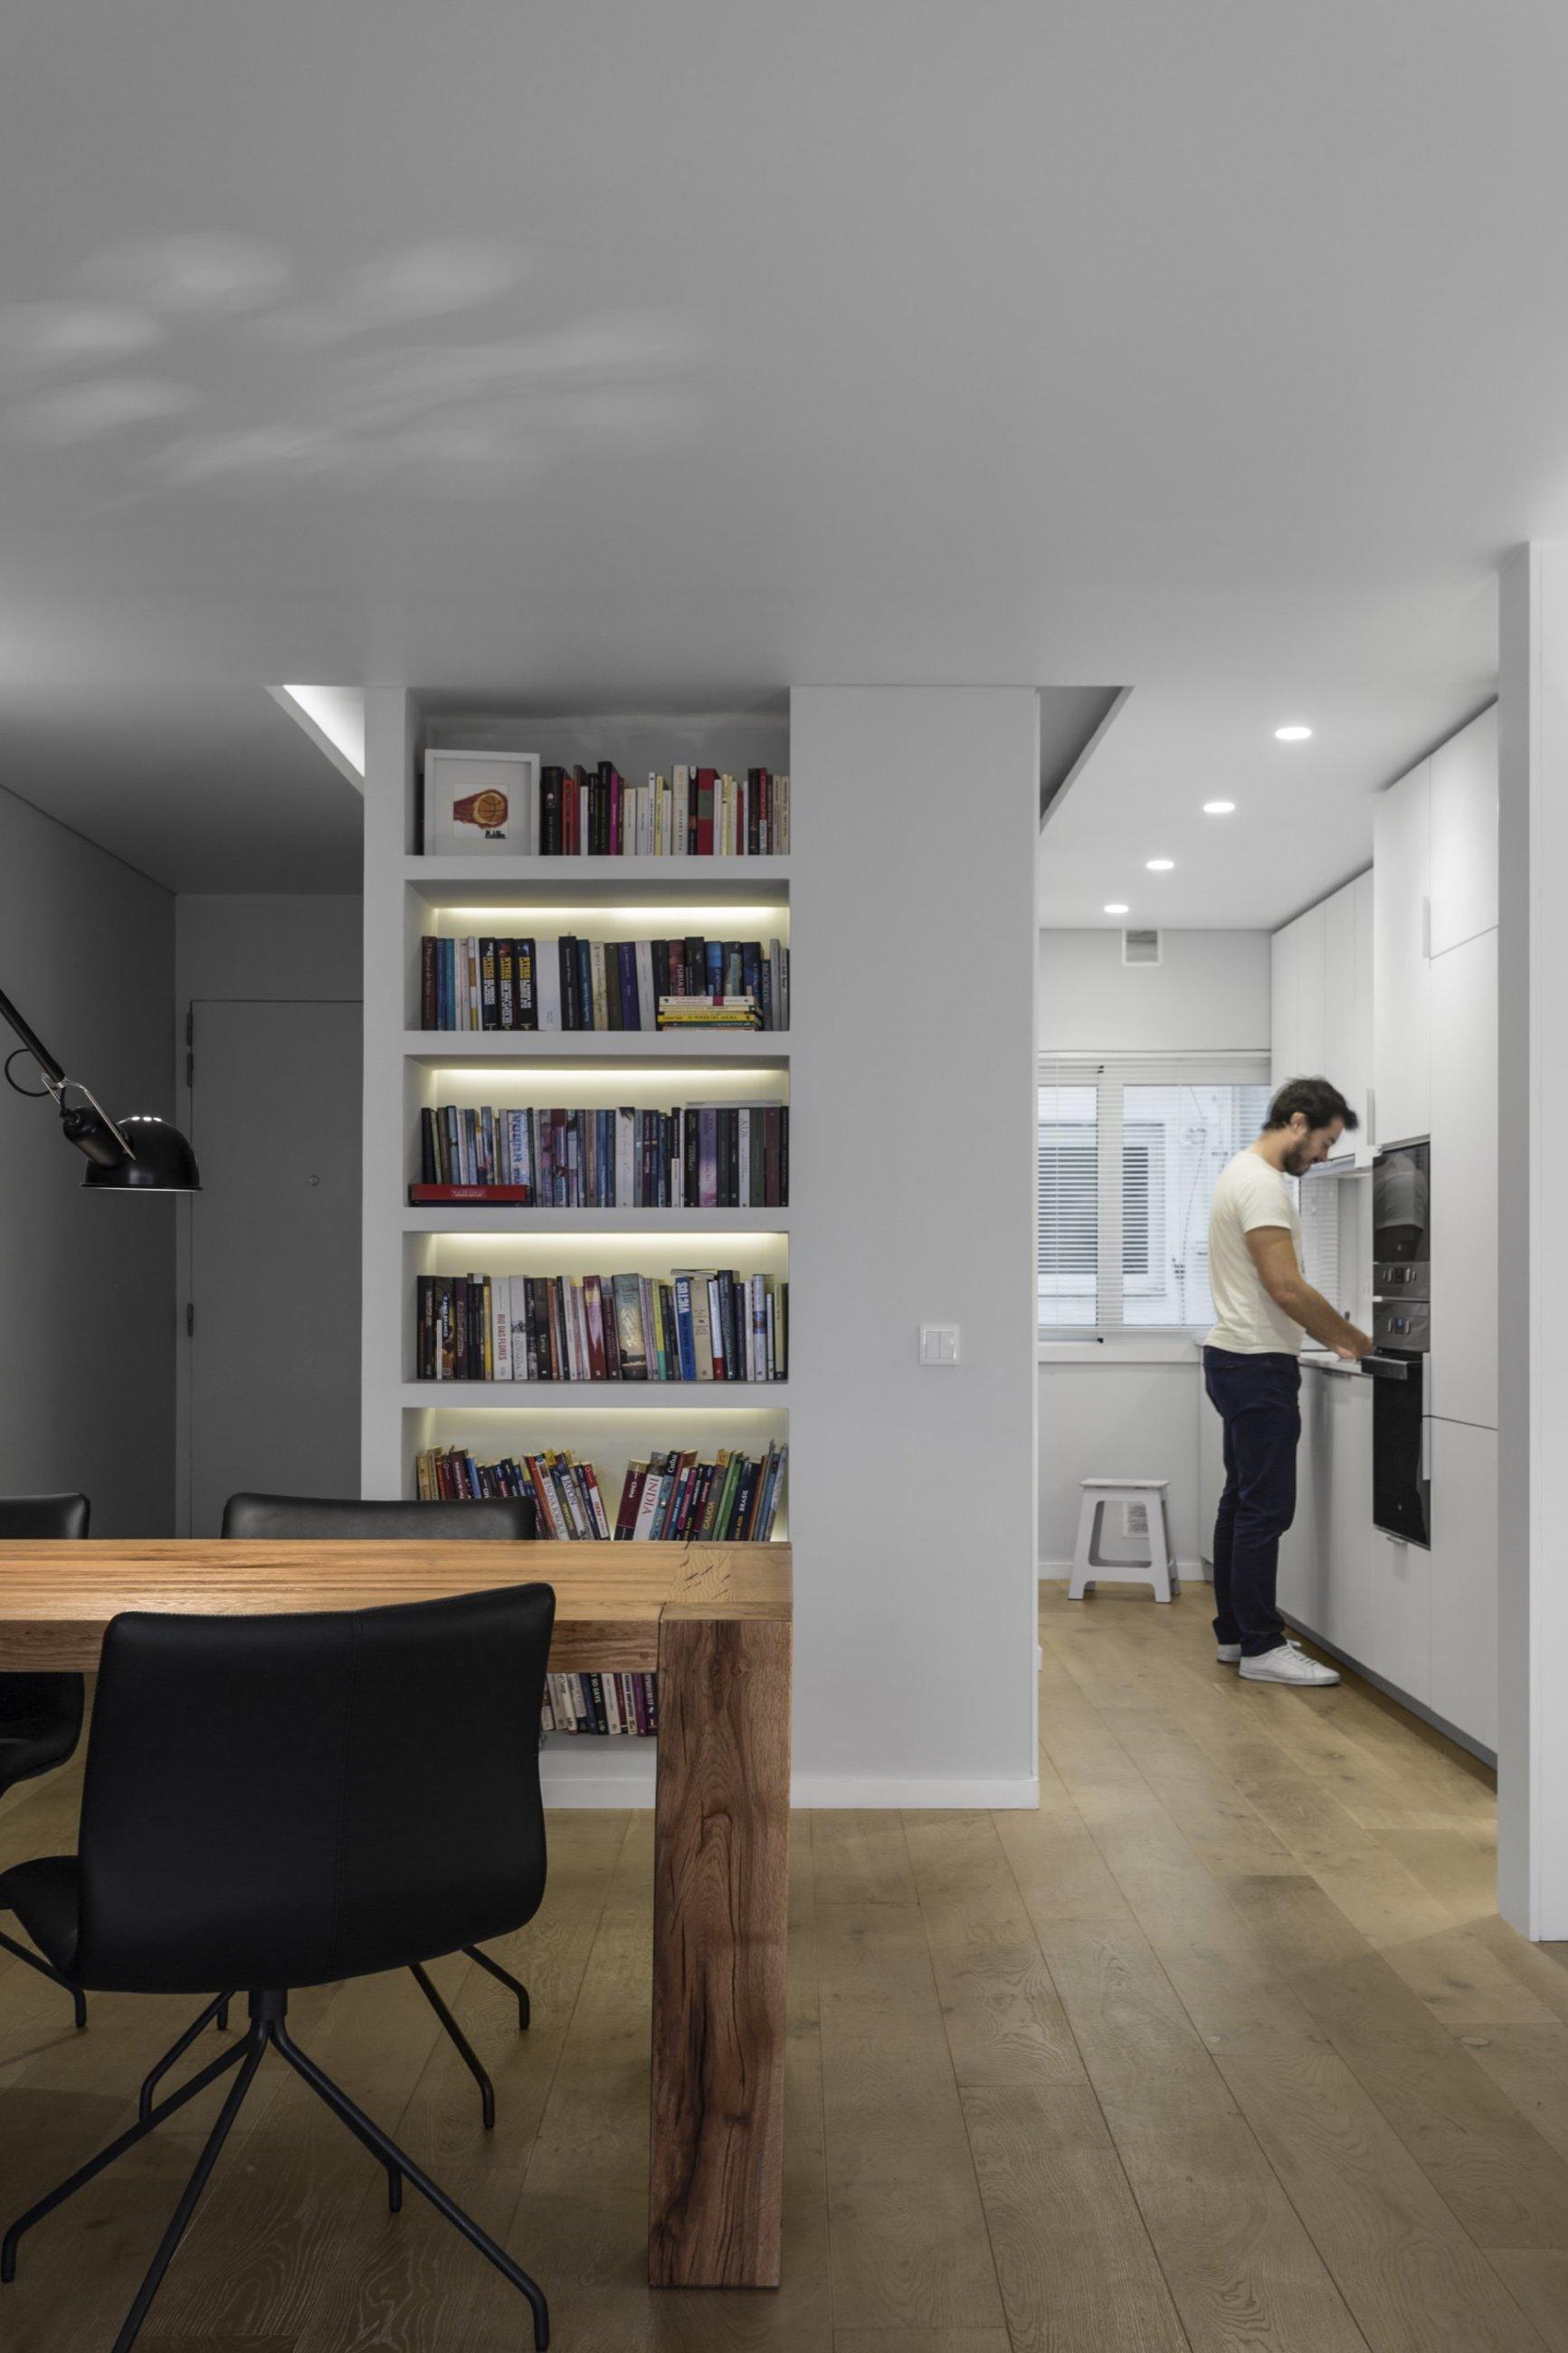 Apartamento Barcelona Arquitecto Paulo Martins 21 do fotografo Ivo Tavares Studio